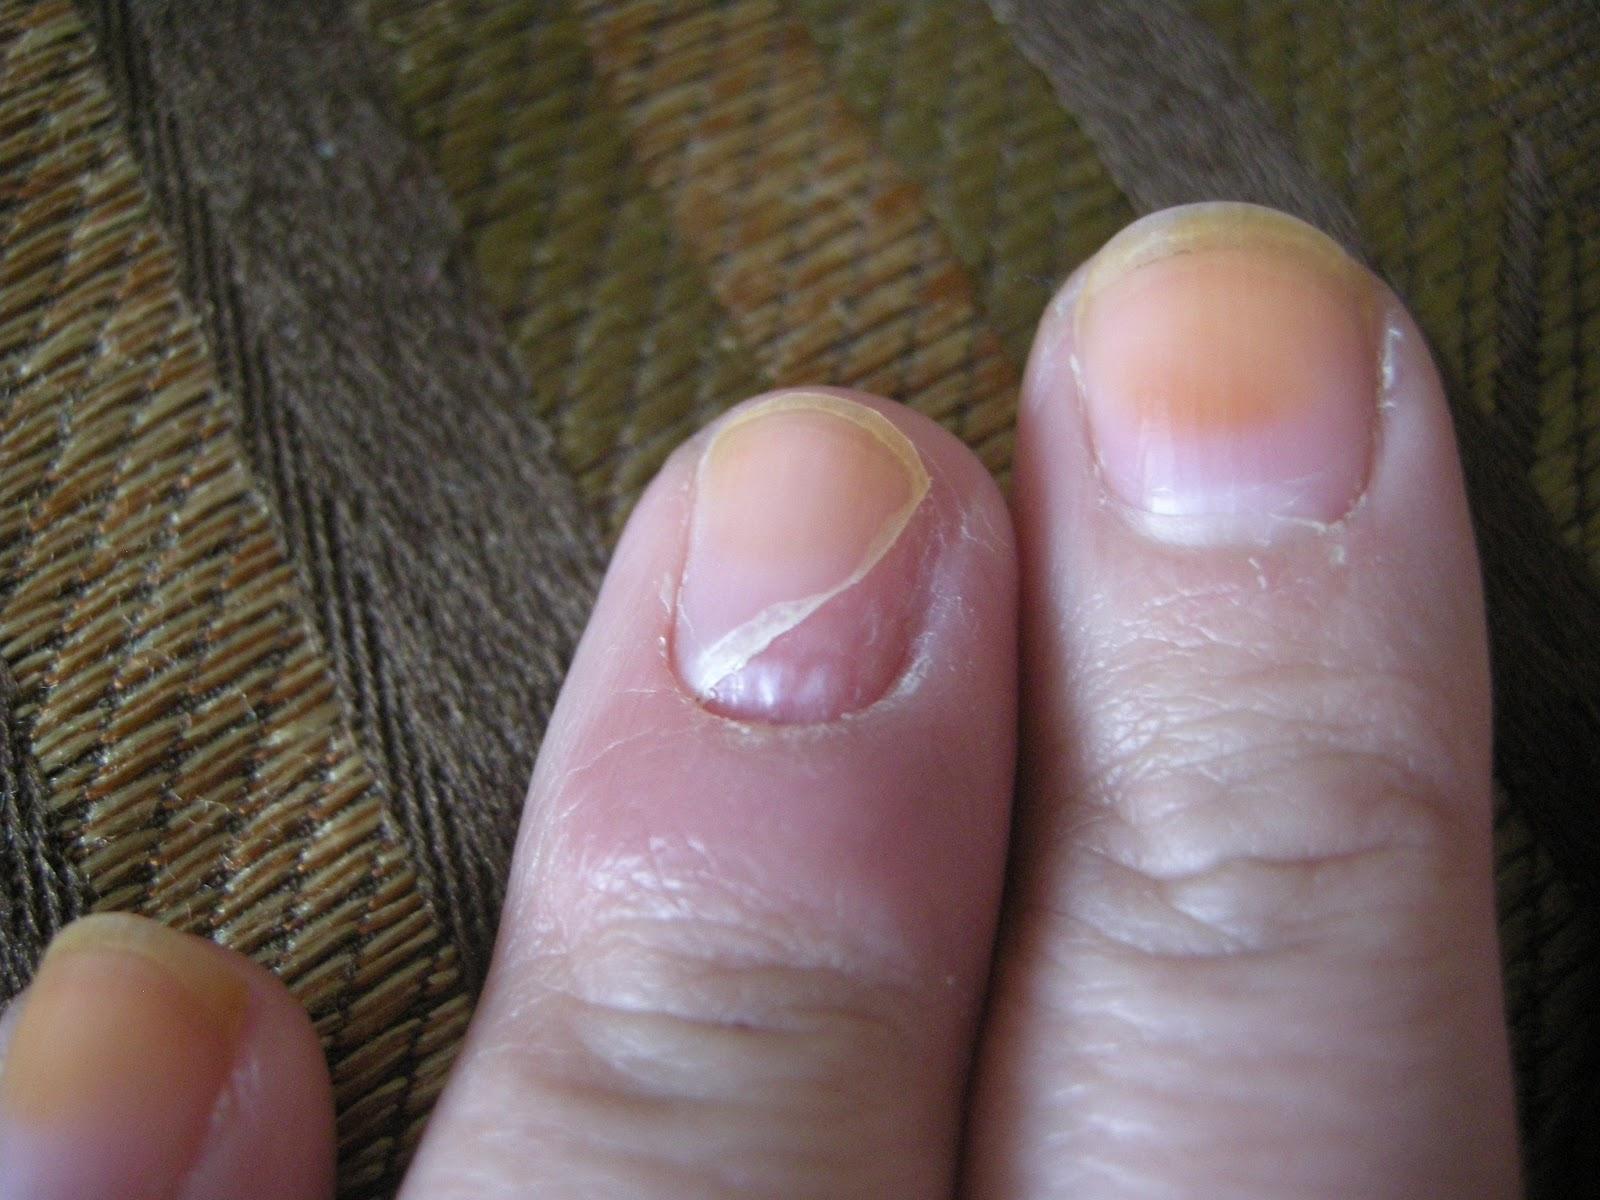 smilejustcoz: Finger infection